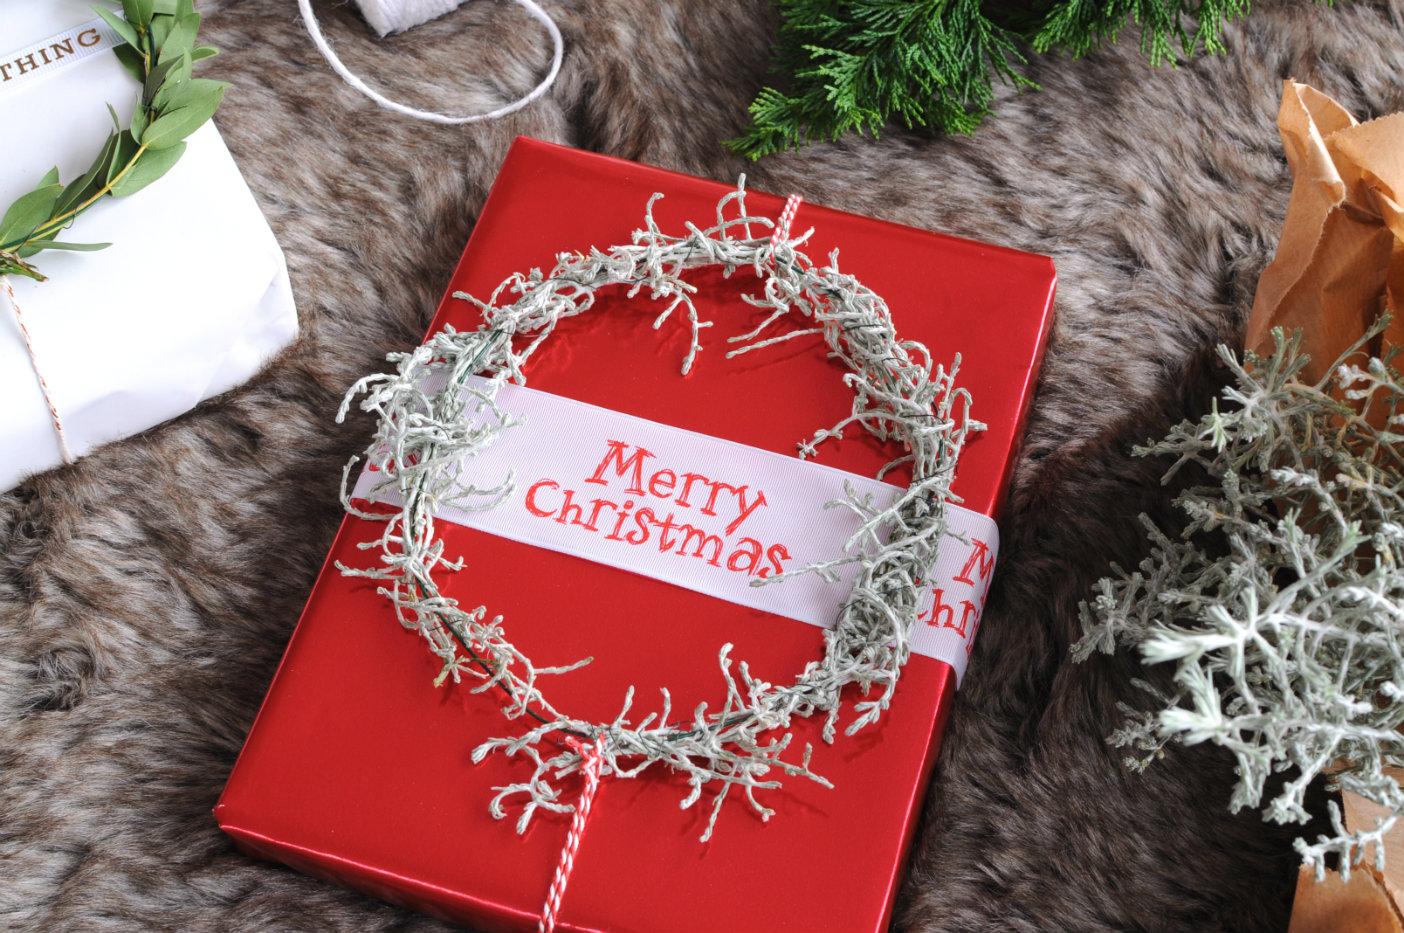 kerstkrans-op-rood-ingepakt-kerstcadeautje